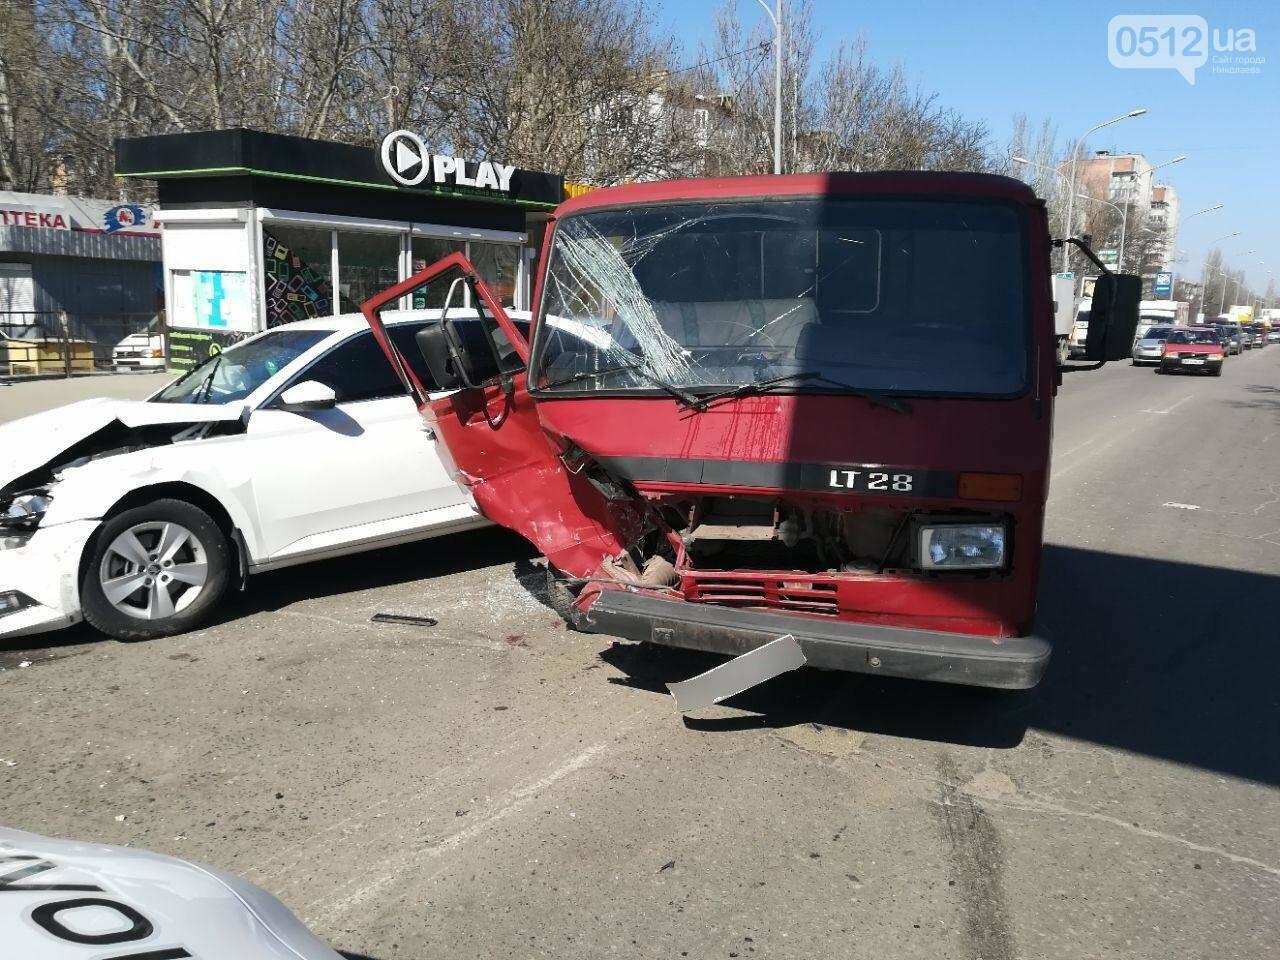 Авария в Николаеве: в результате ДТП пострадало четыре человека, среди них ребенок, - ФОТО, фото-2